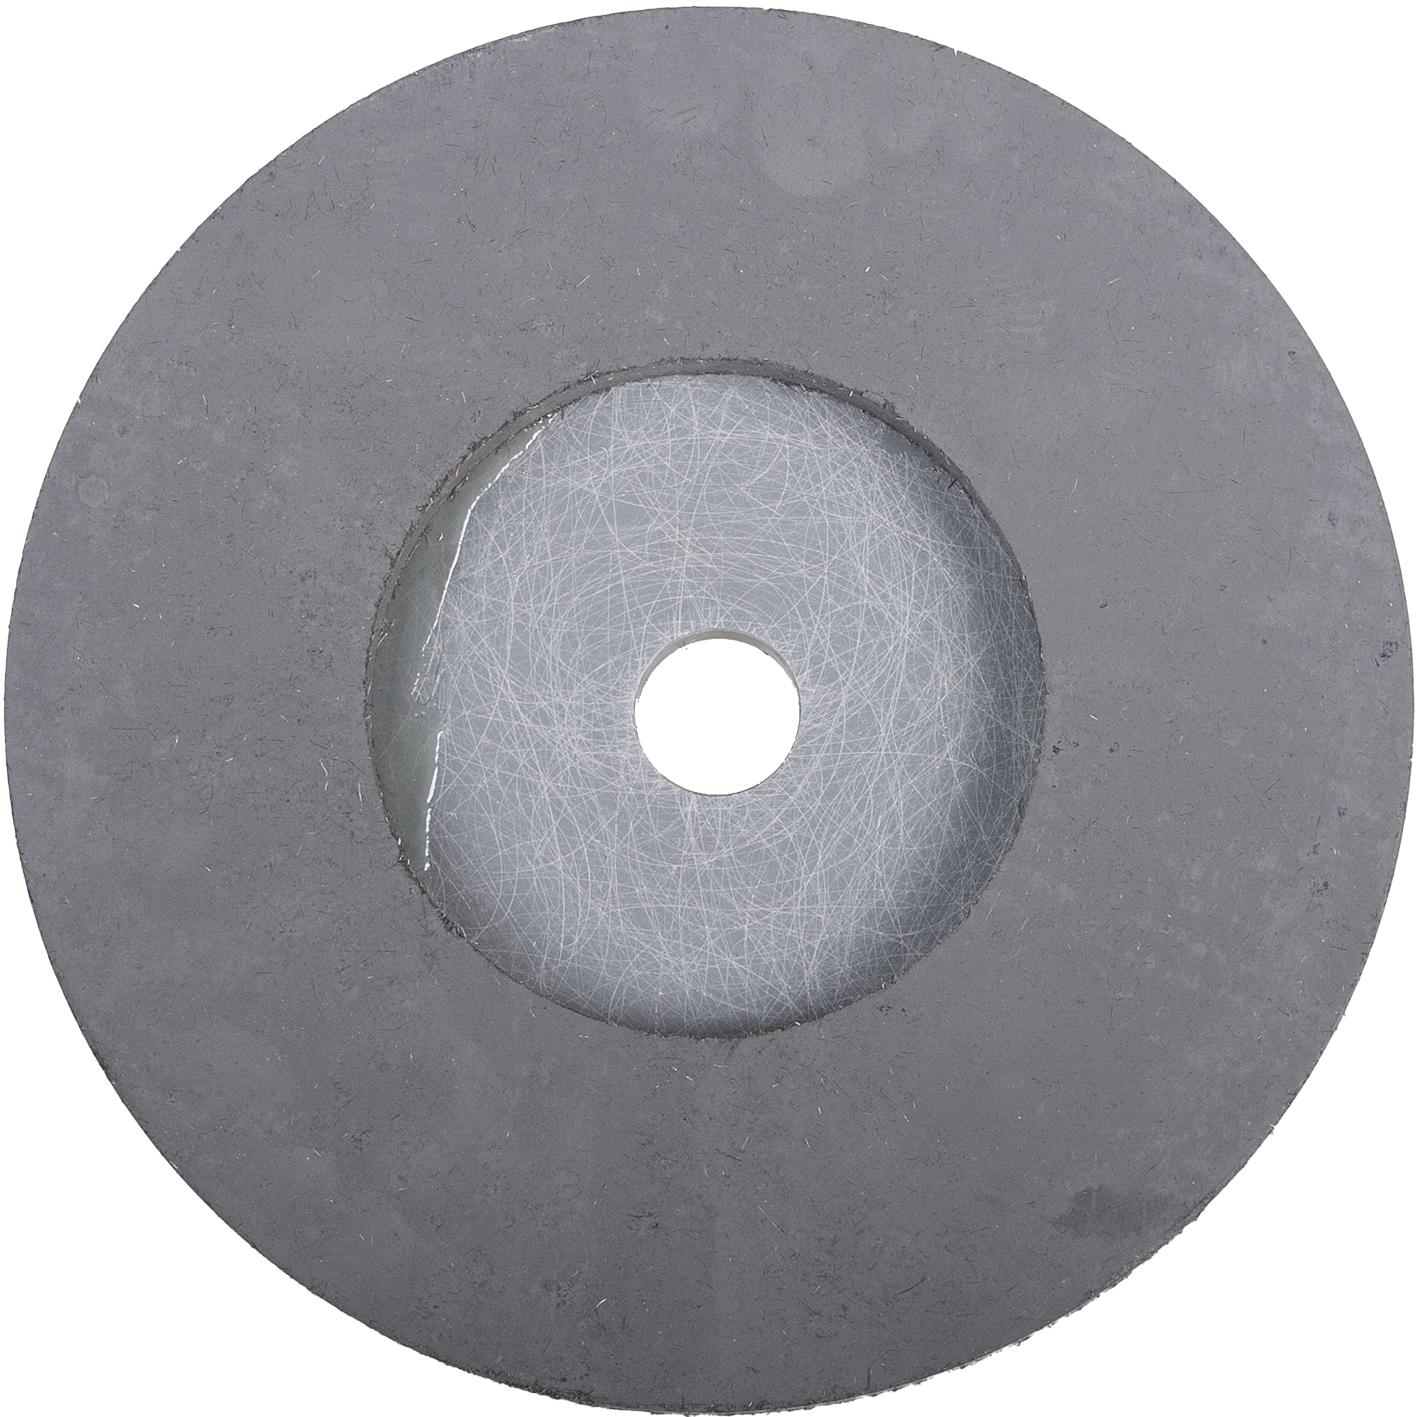 Diamantschleifteller OCTRON ø 250 mm   Klett   BUFF